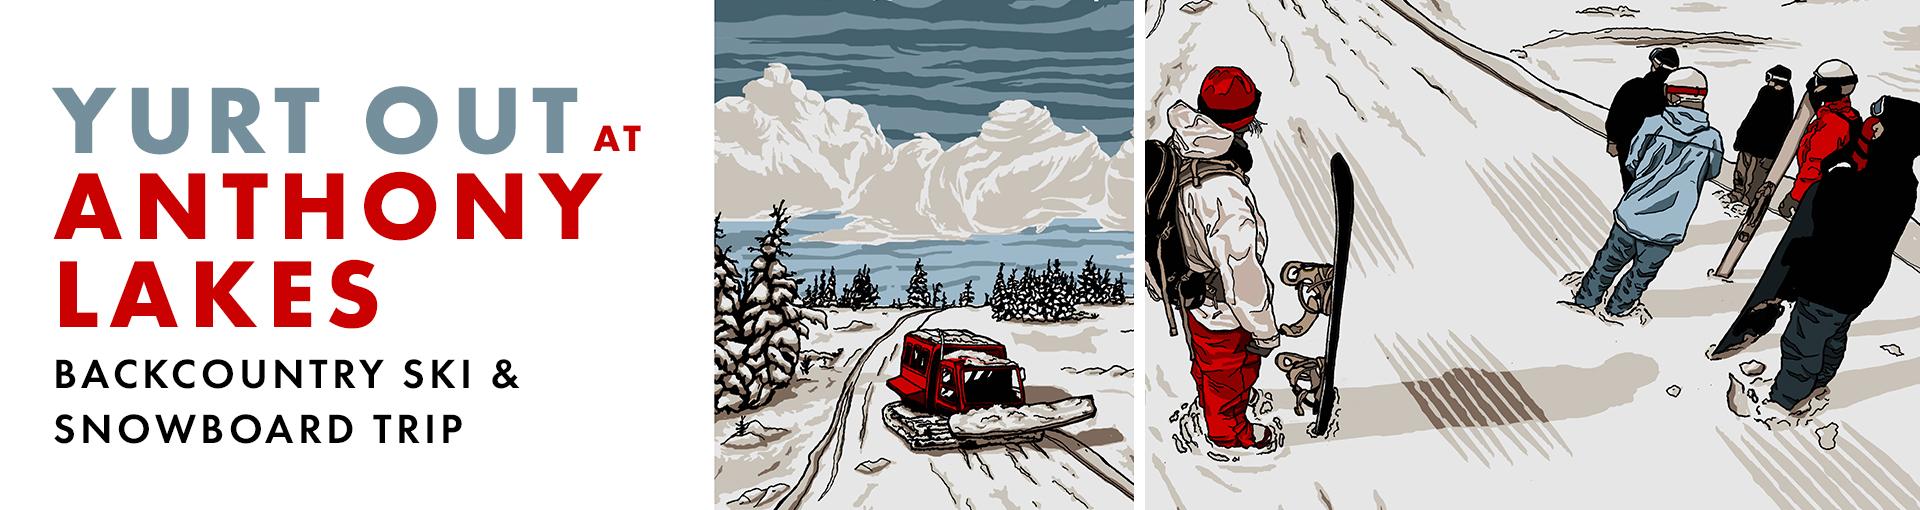 Yurt Out Backcountry Ski Trip